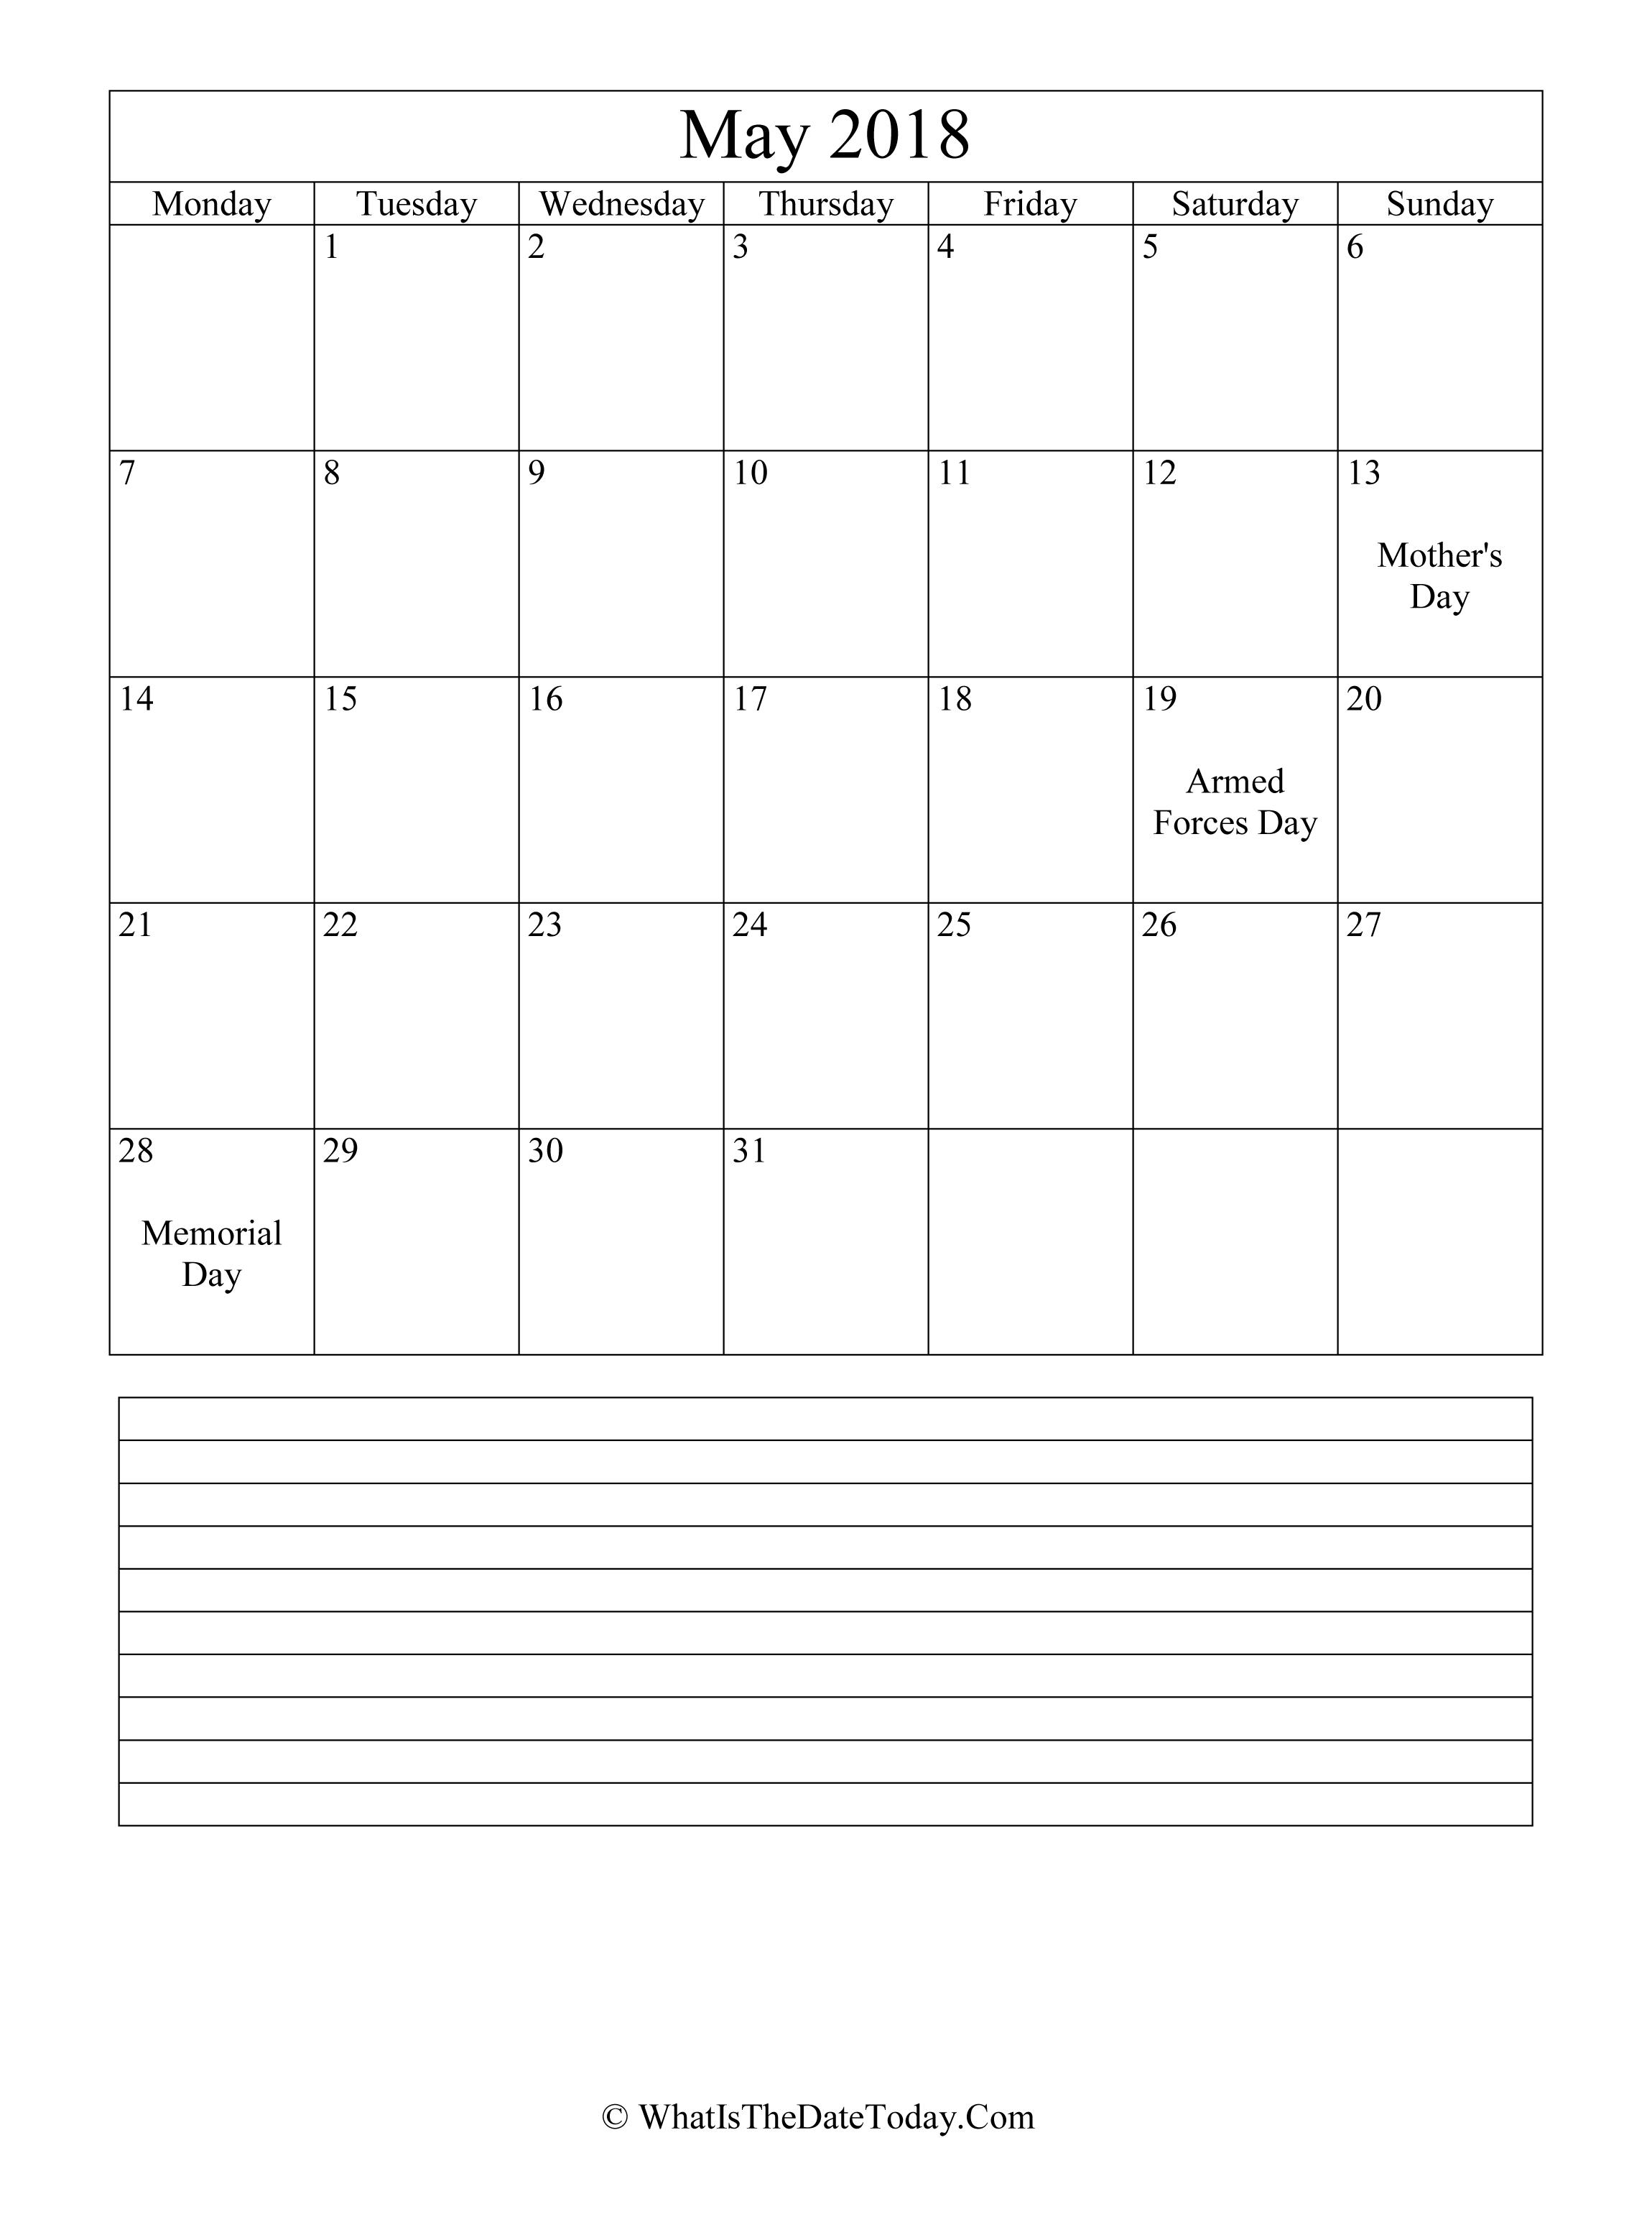 version 2018 calendar